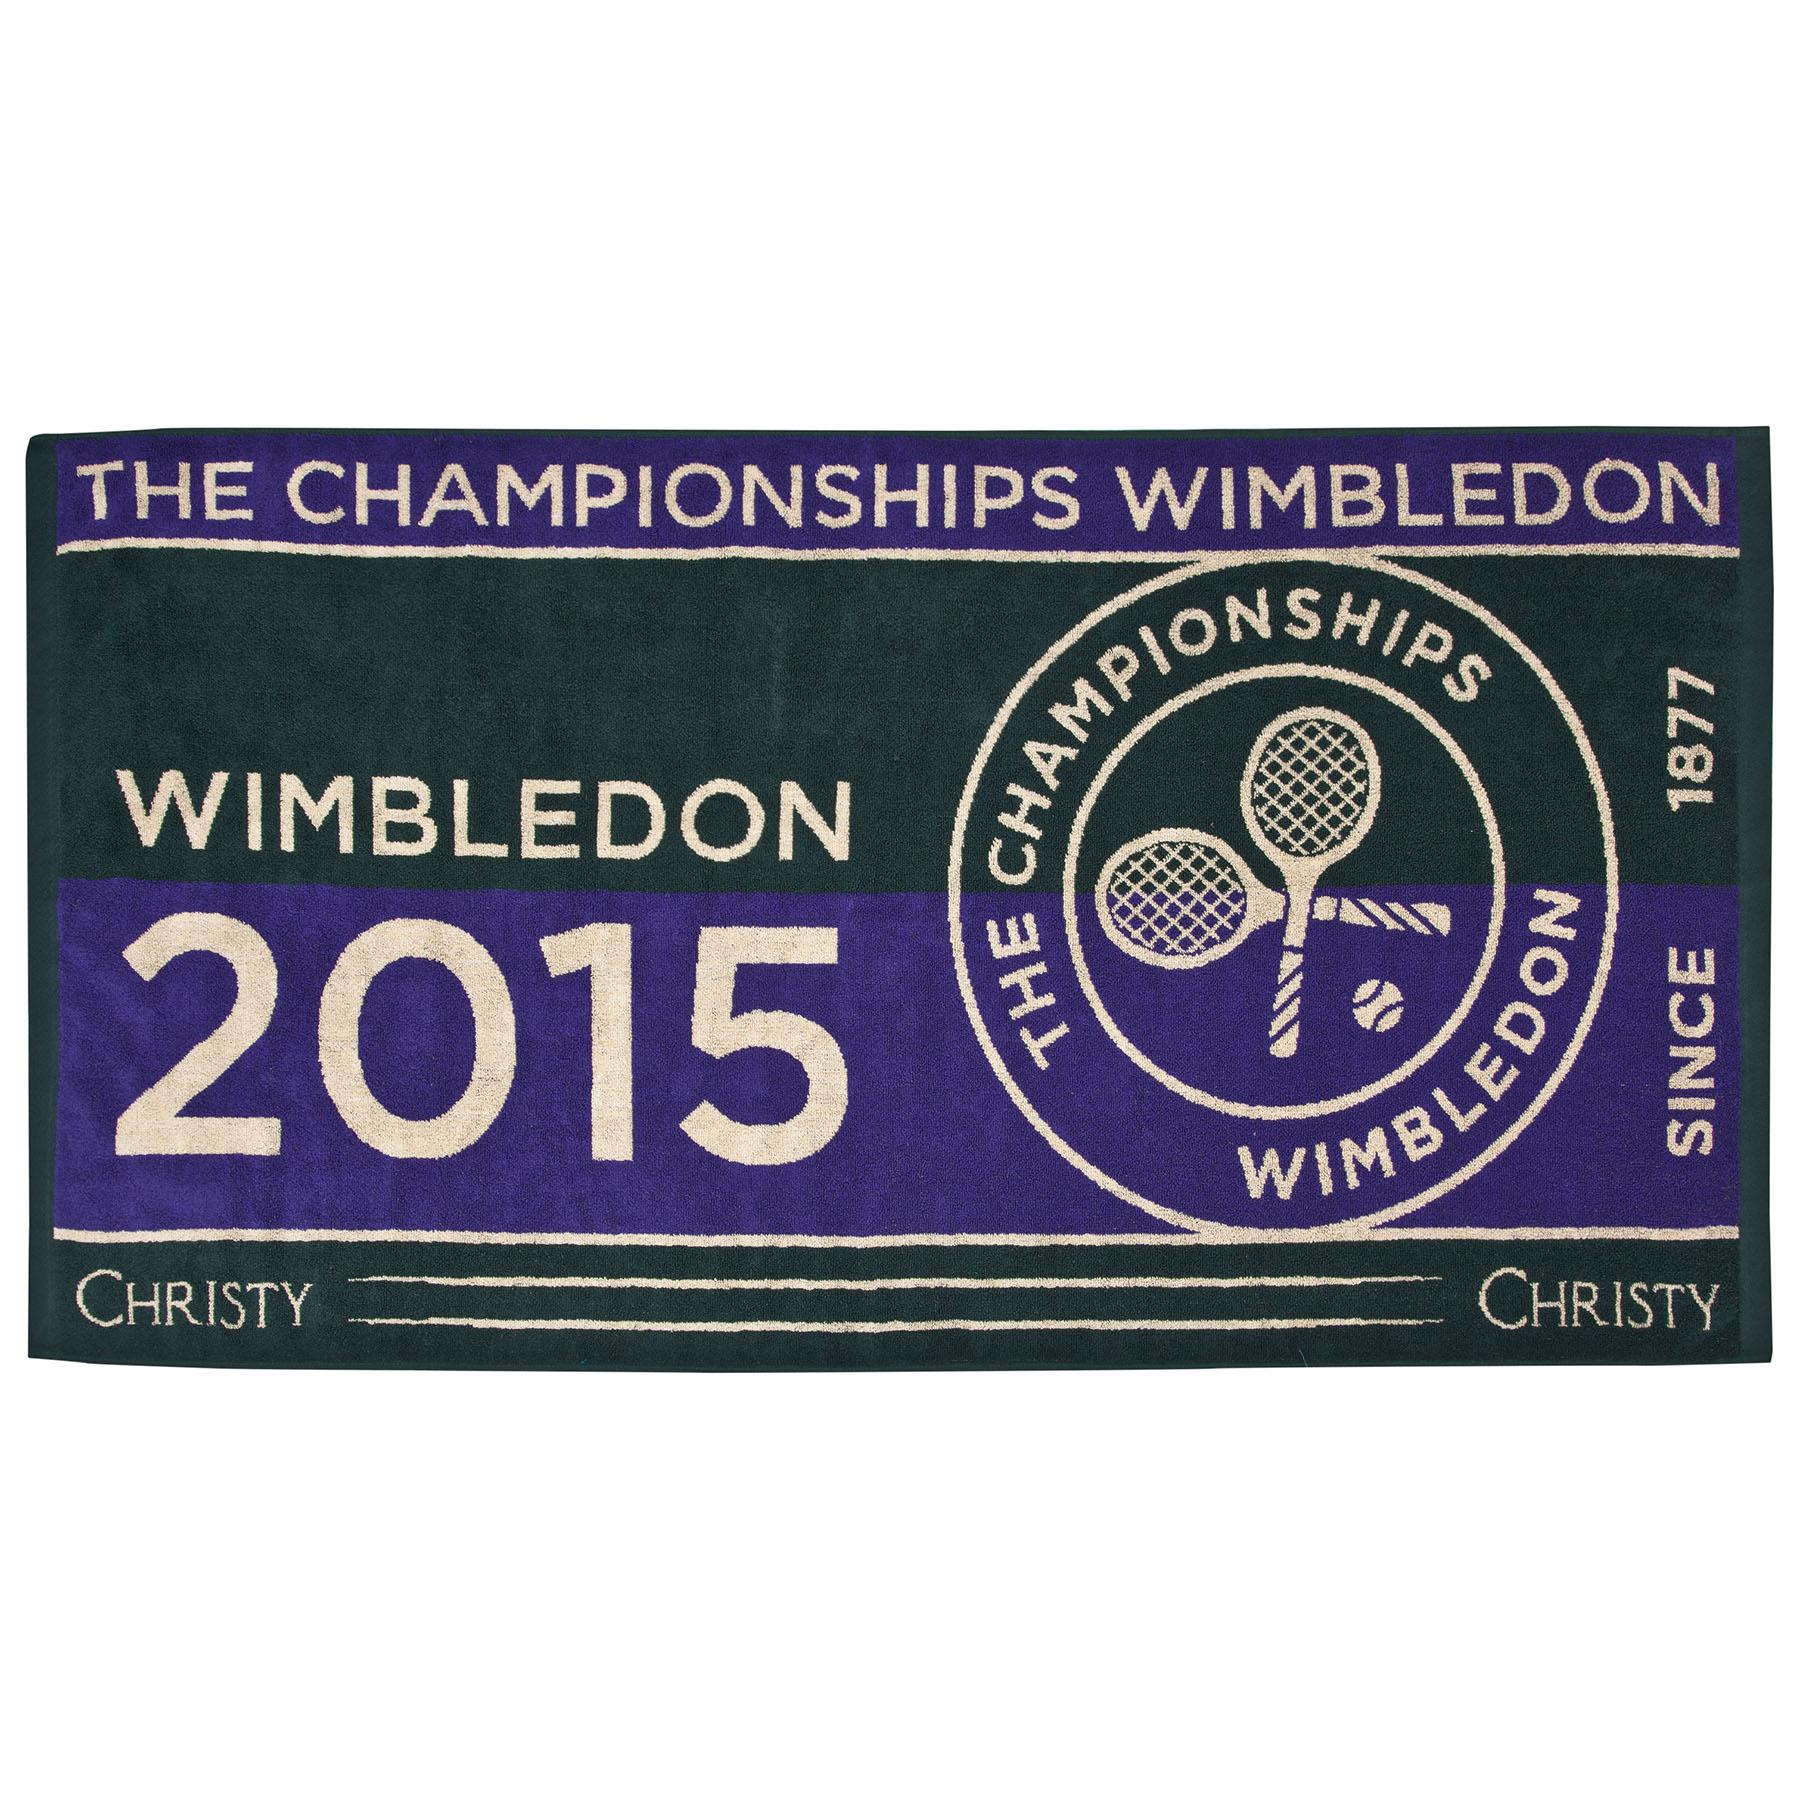 Wimbledon Mens Championship Towel 2015 - Green